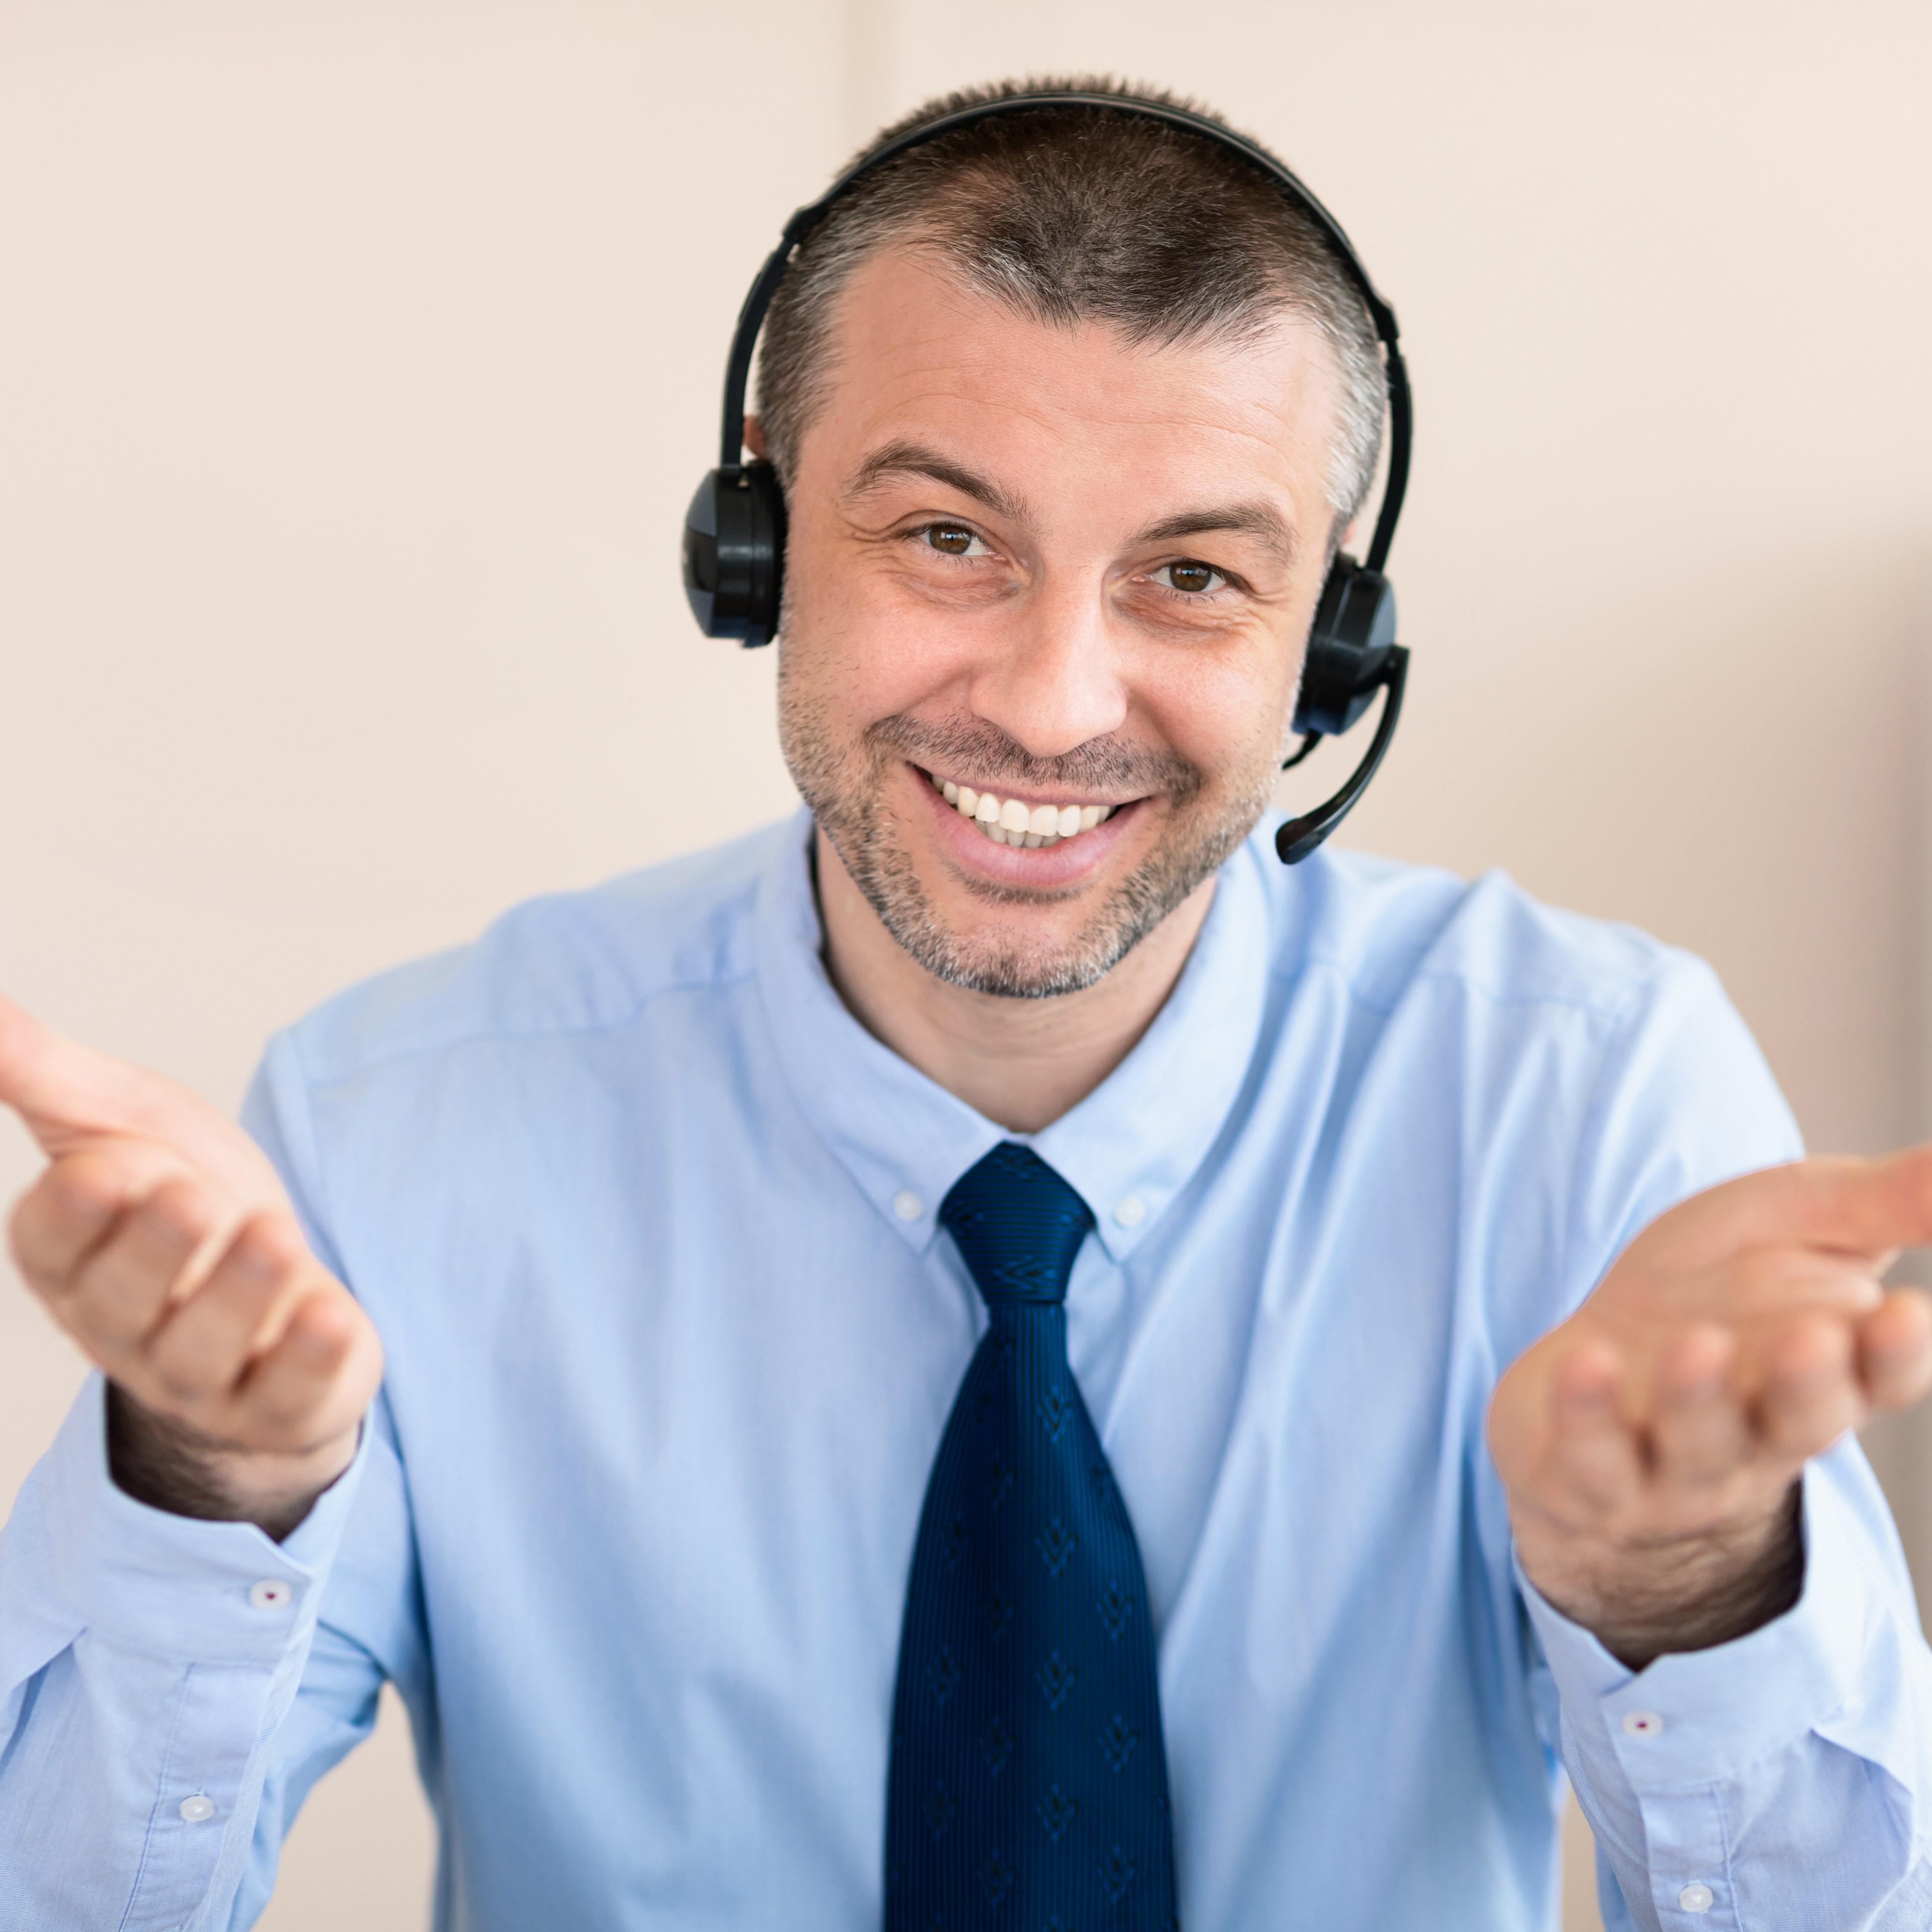 A happy customer service agent.